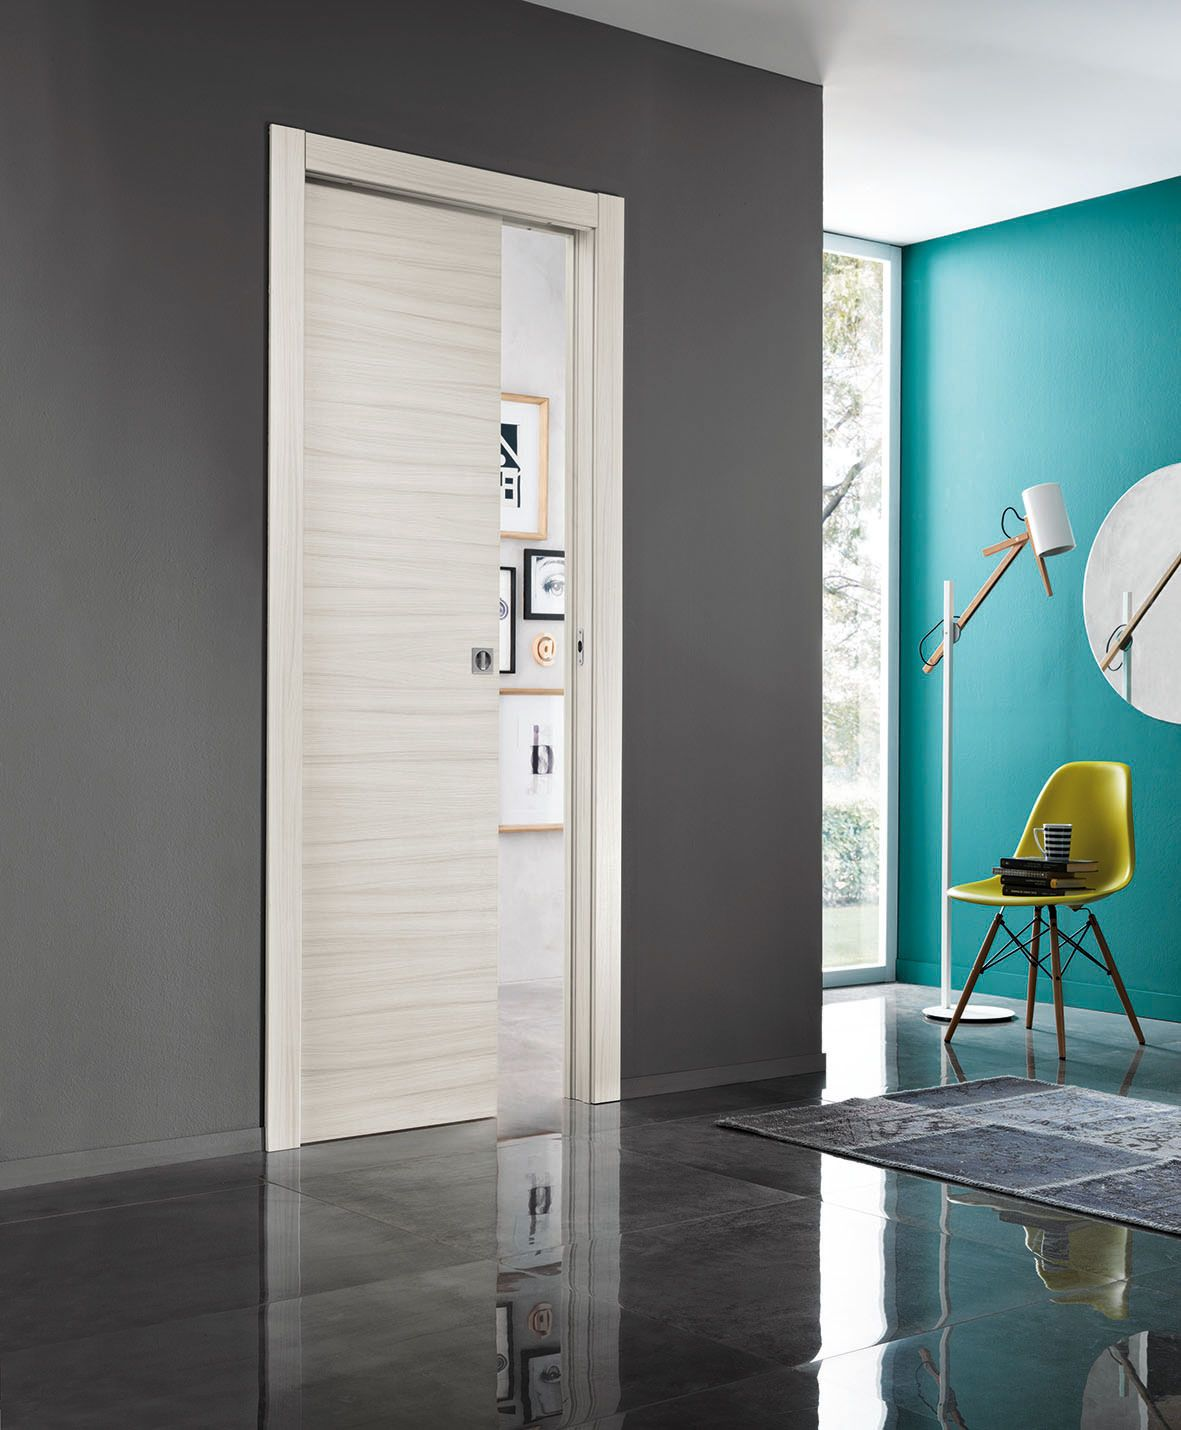 Porta Scrigno 60 Cm porte comfort e trésor by scrigno: eleganza, design e